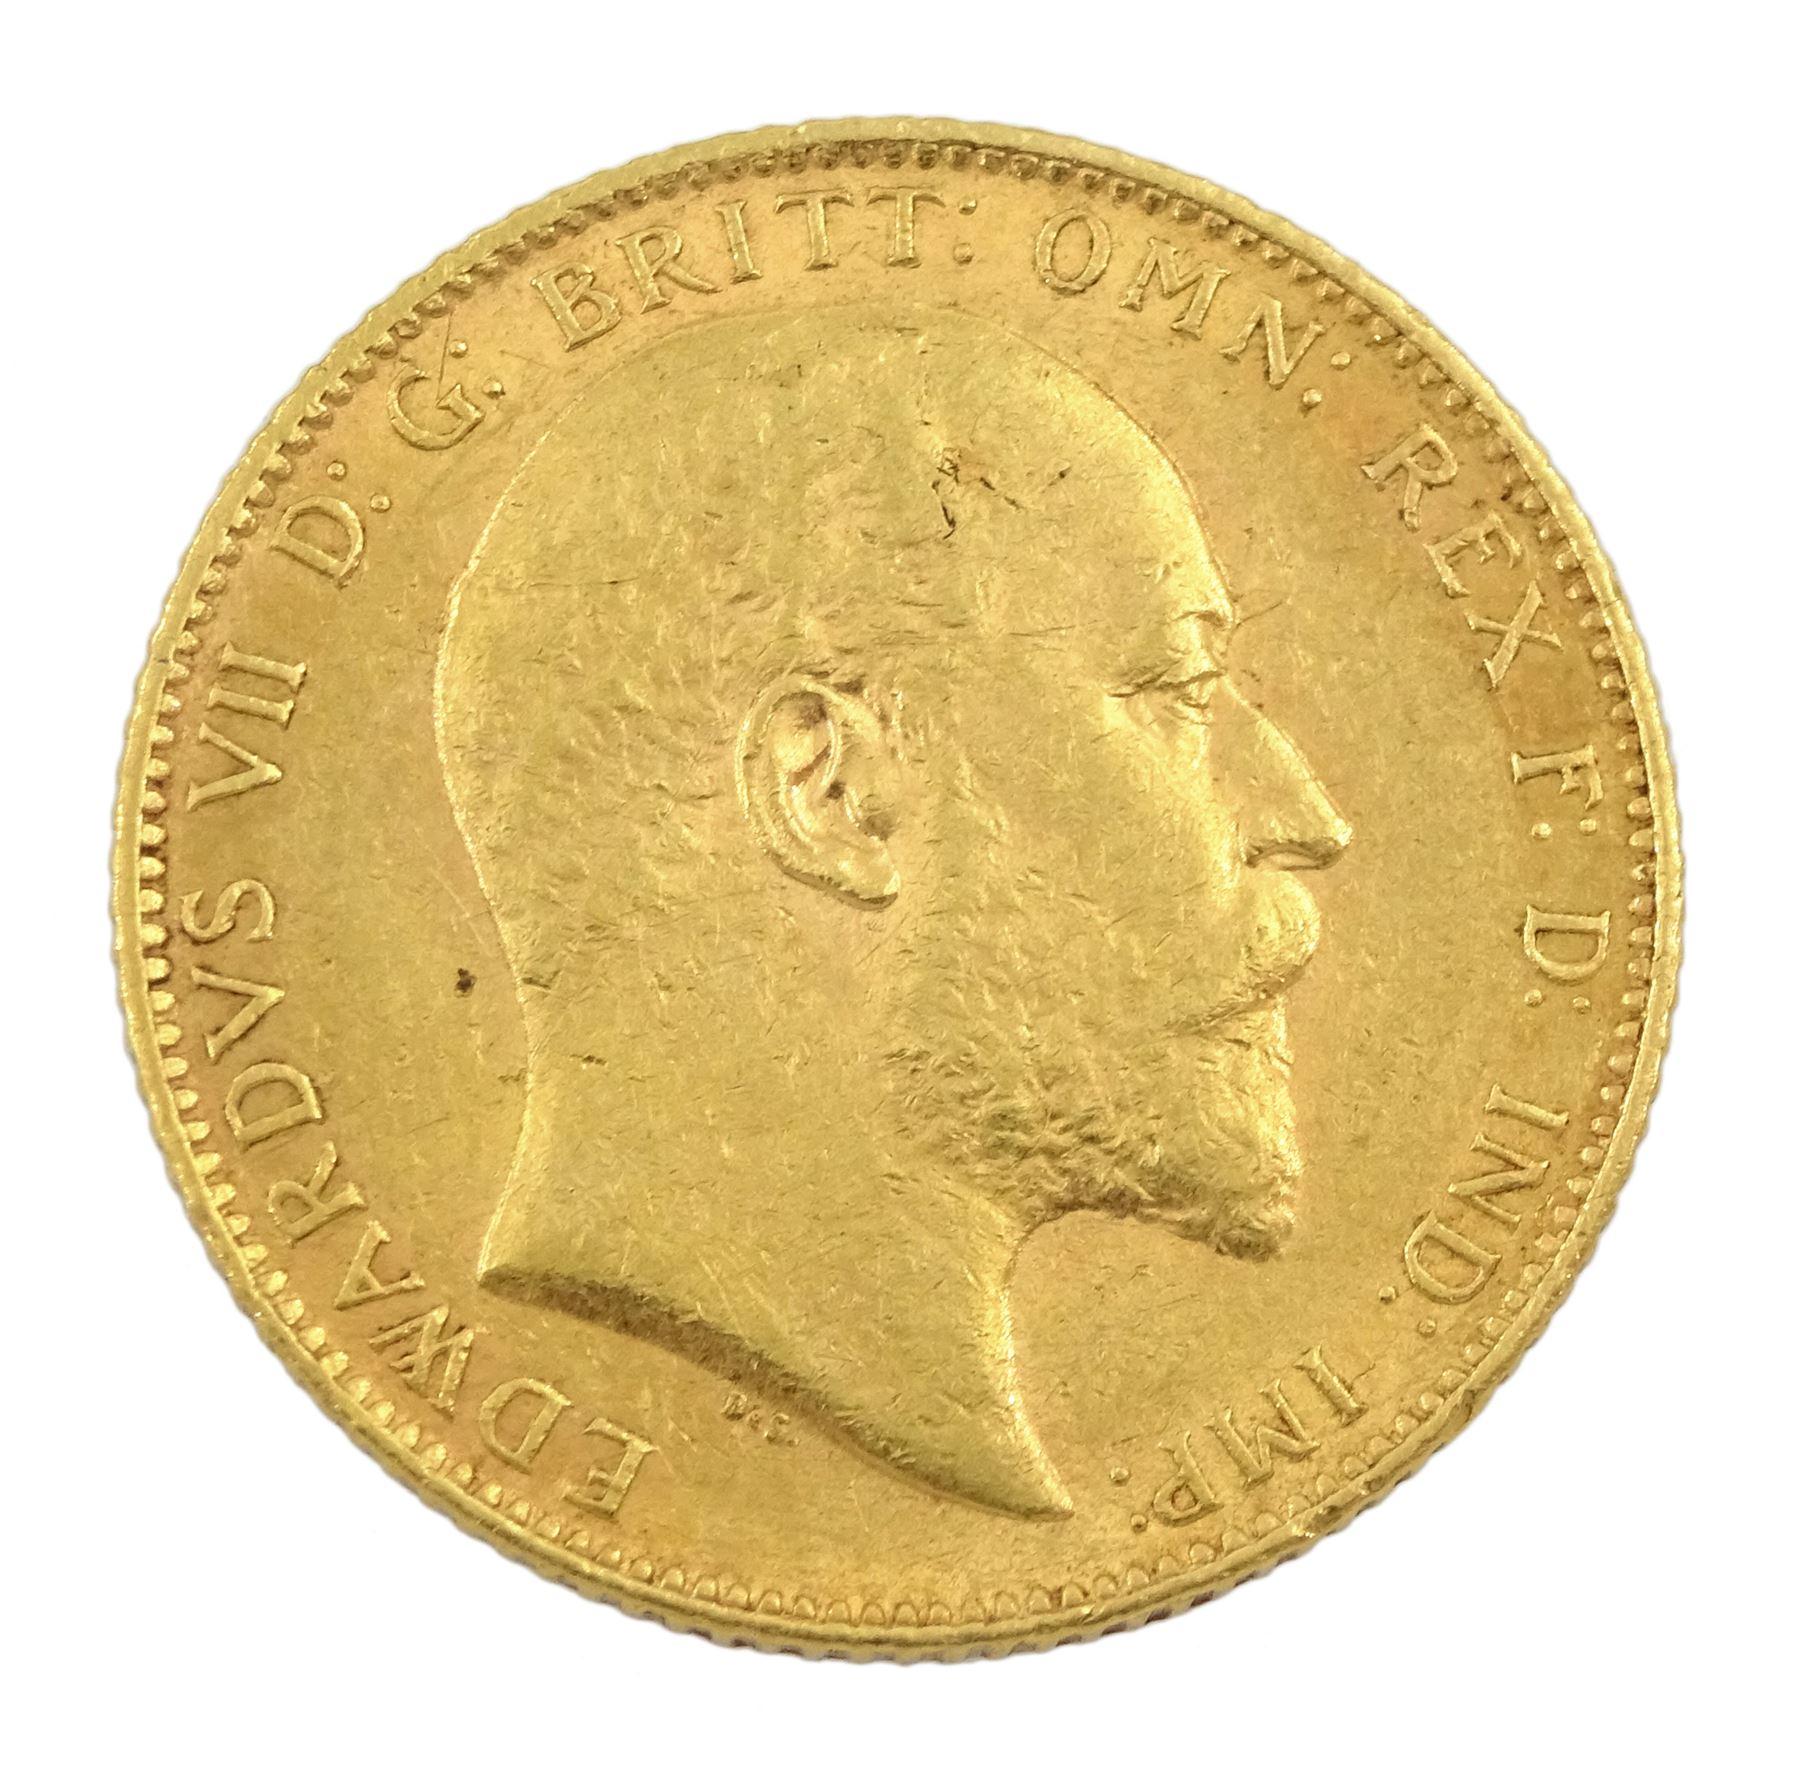 King Edward VII 1903 gold full sovereign coin